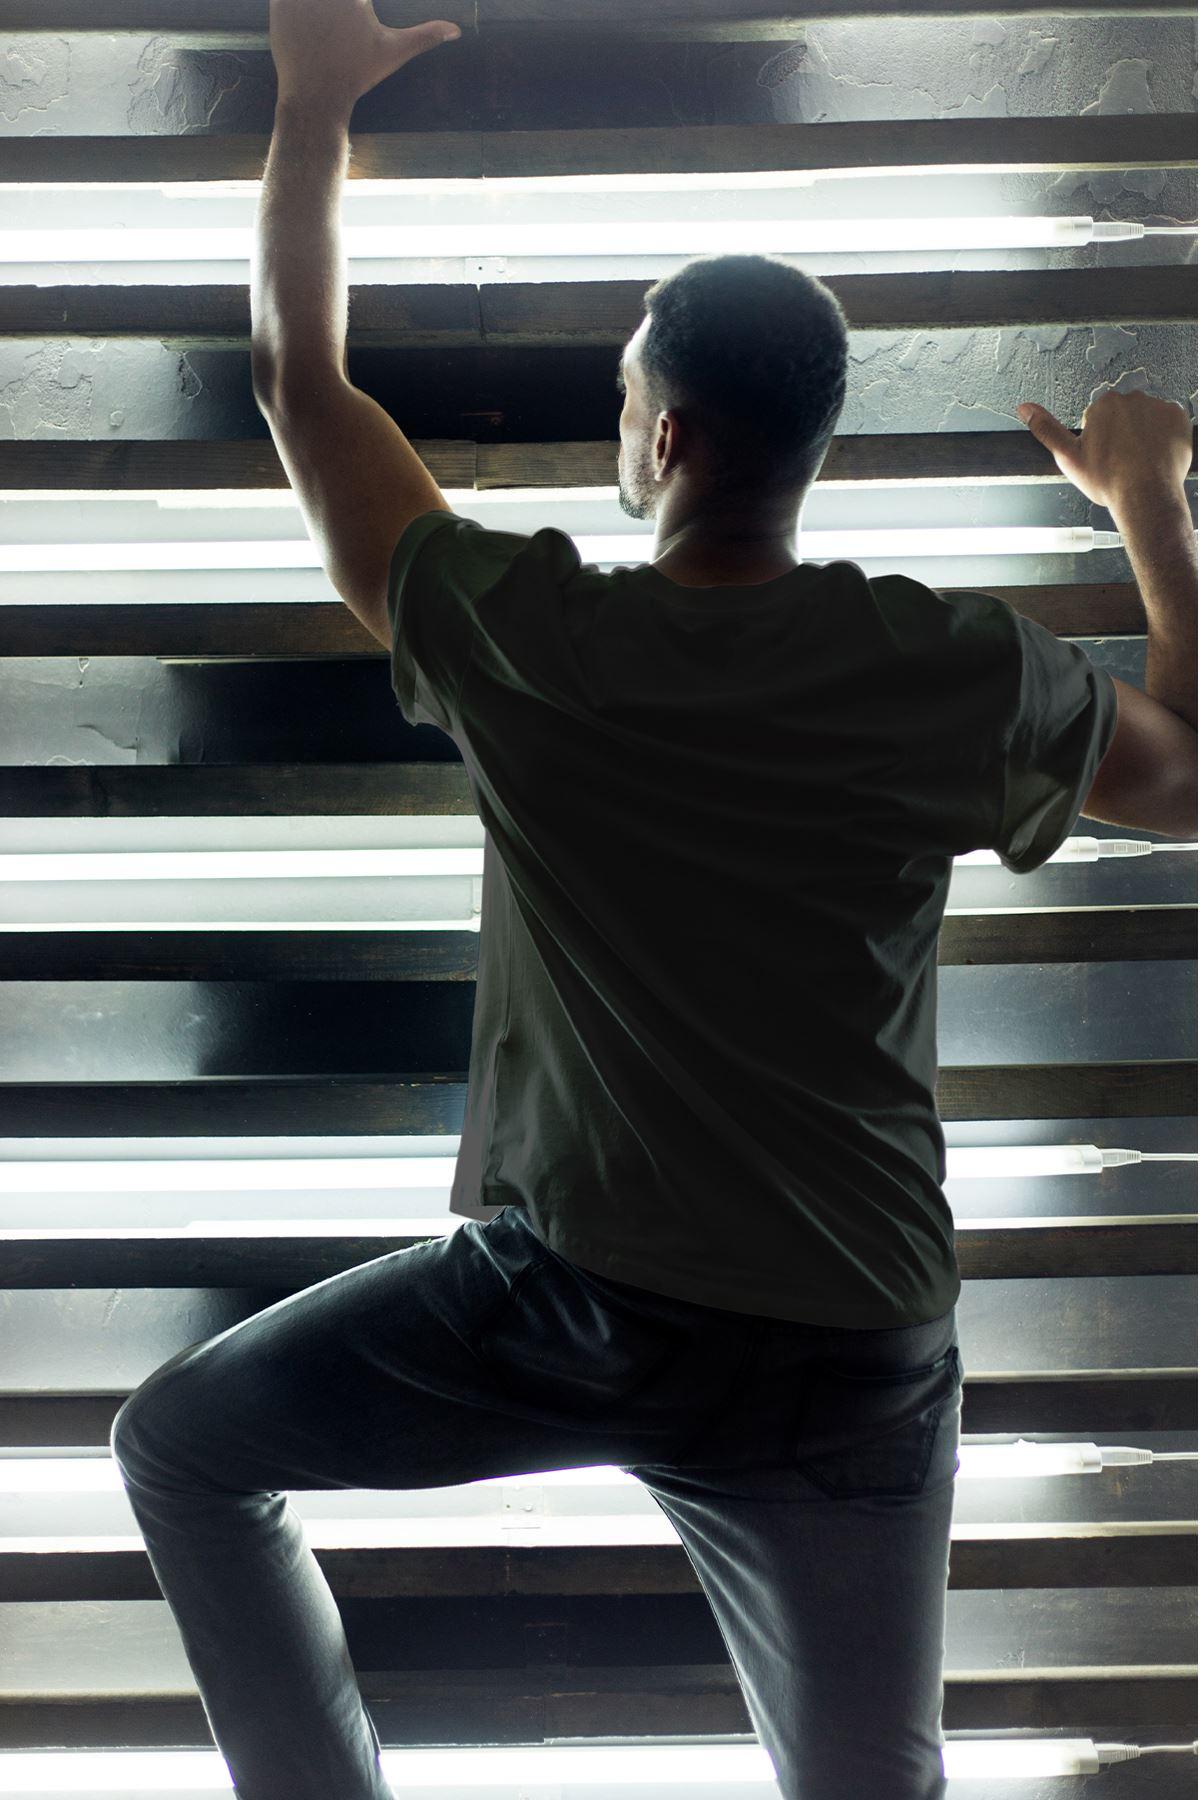 Erk Siyah Erkek Oversize Tshirt - Tişört